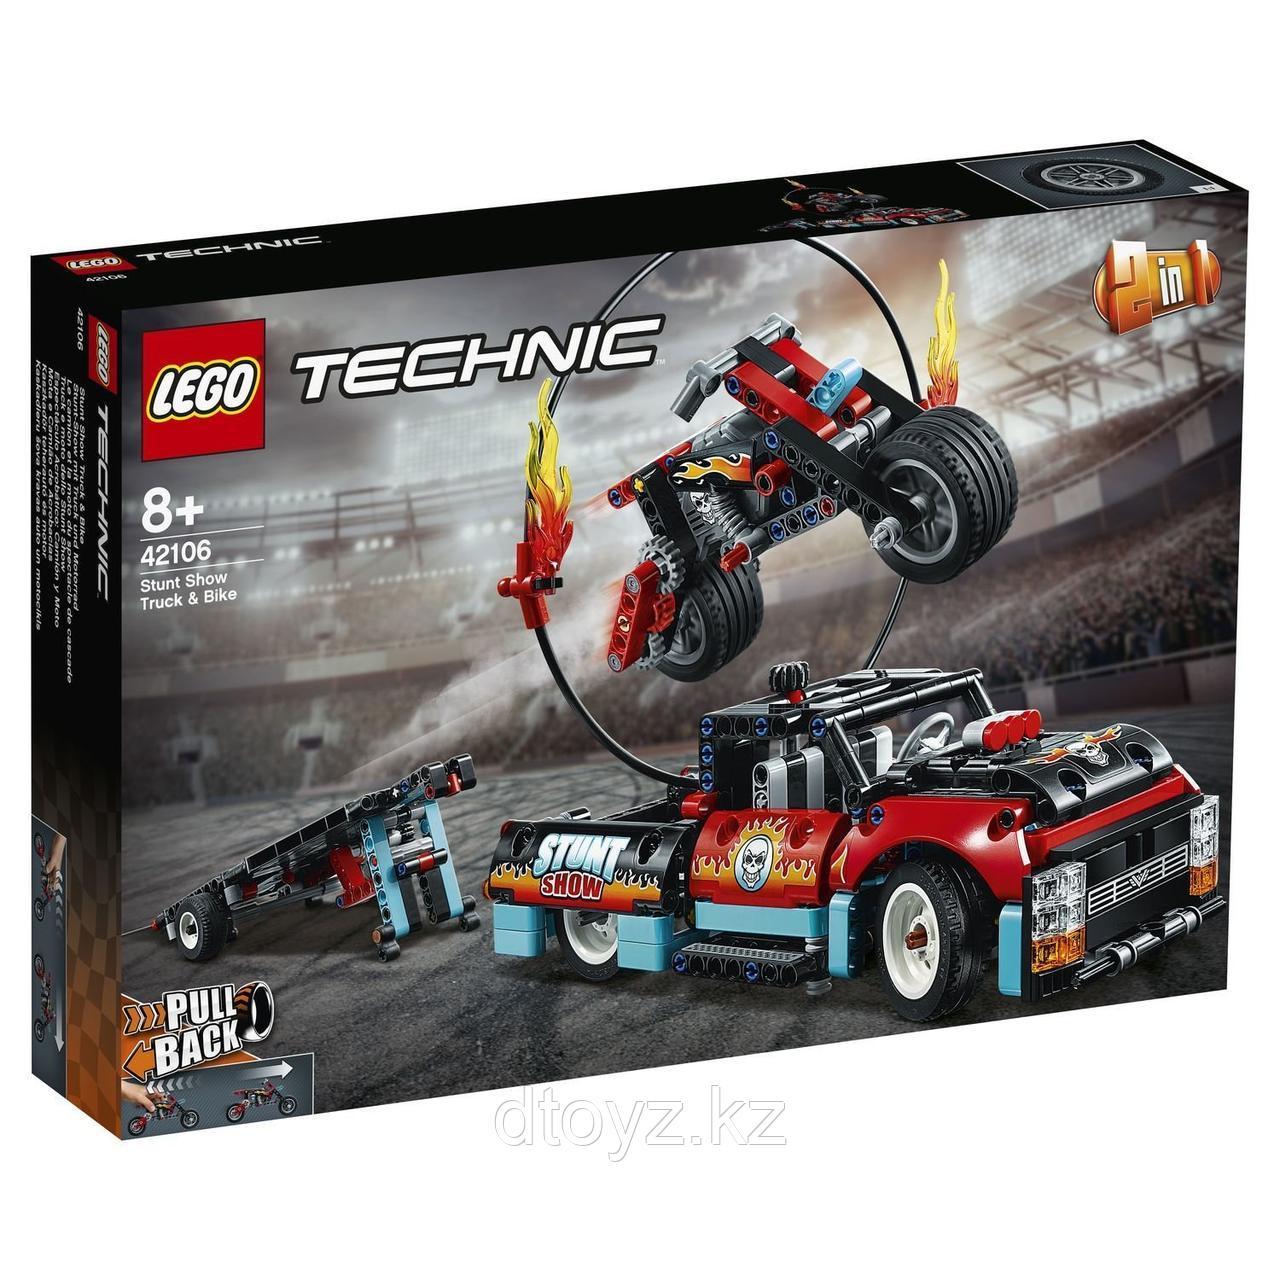 Lego Technic 42106 Шоу трюков на грузовиках и мотоциклах